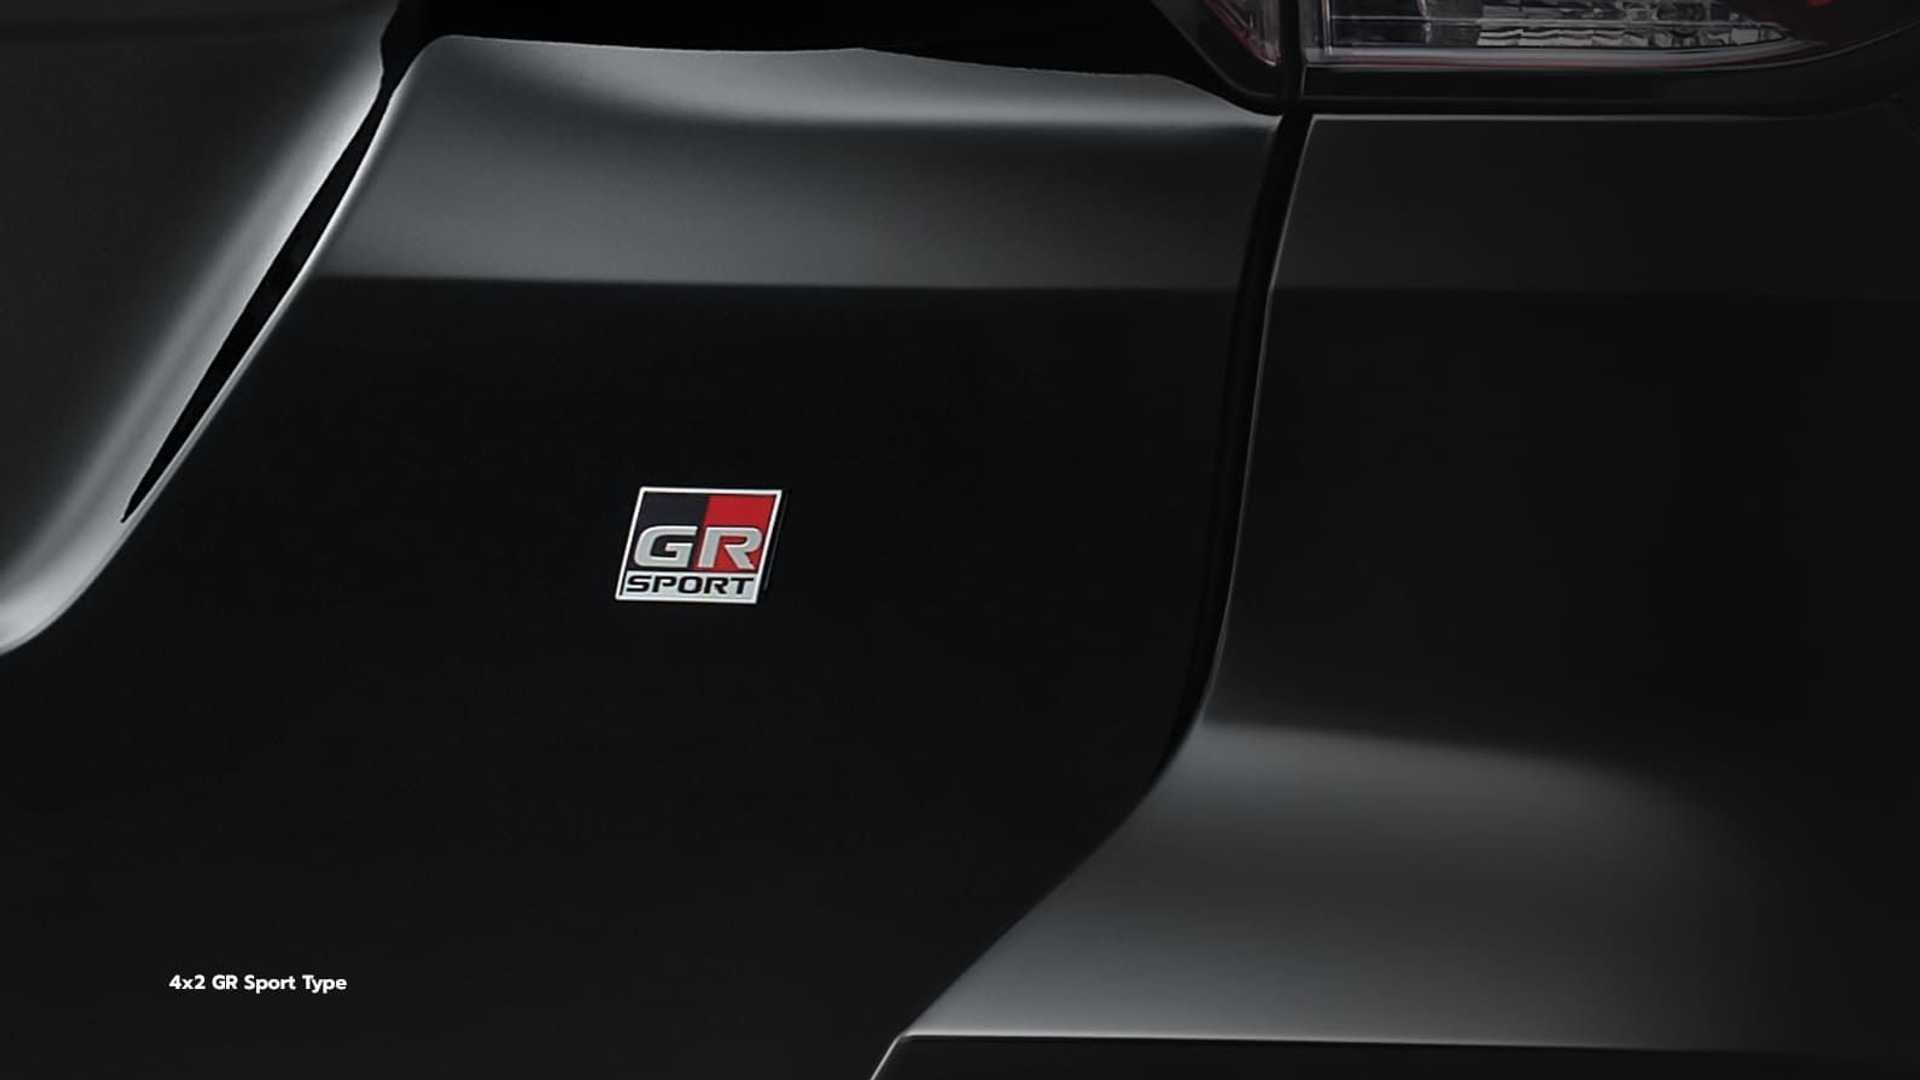 Toyota-Fortuner-GR-Sport-7